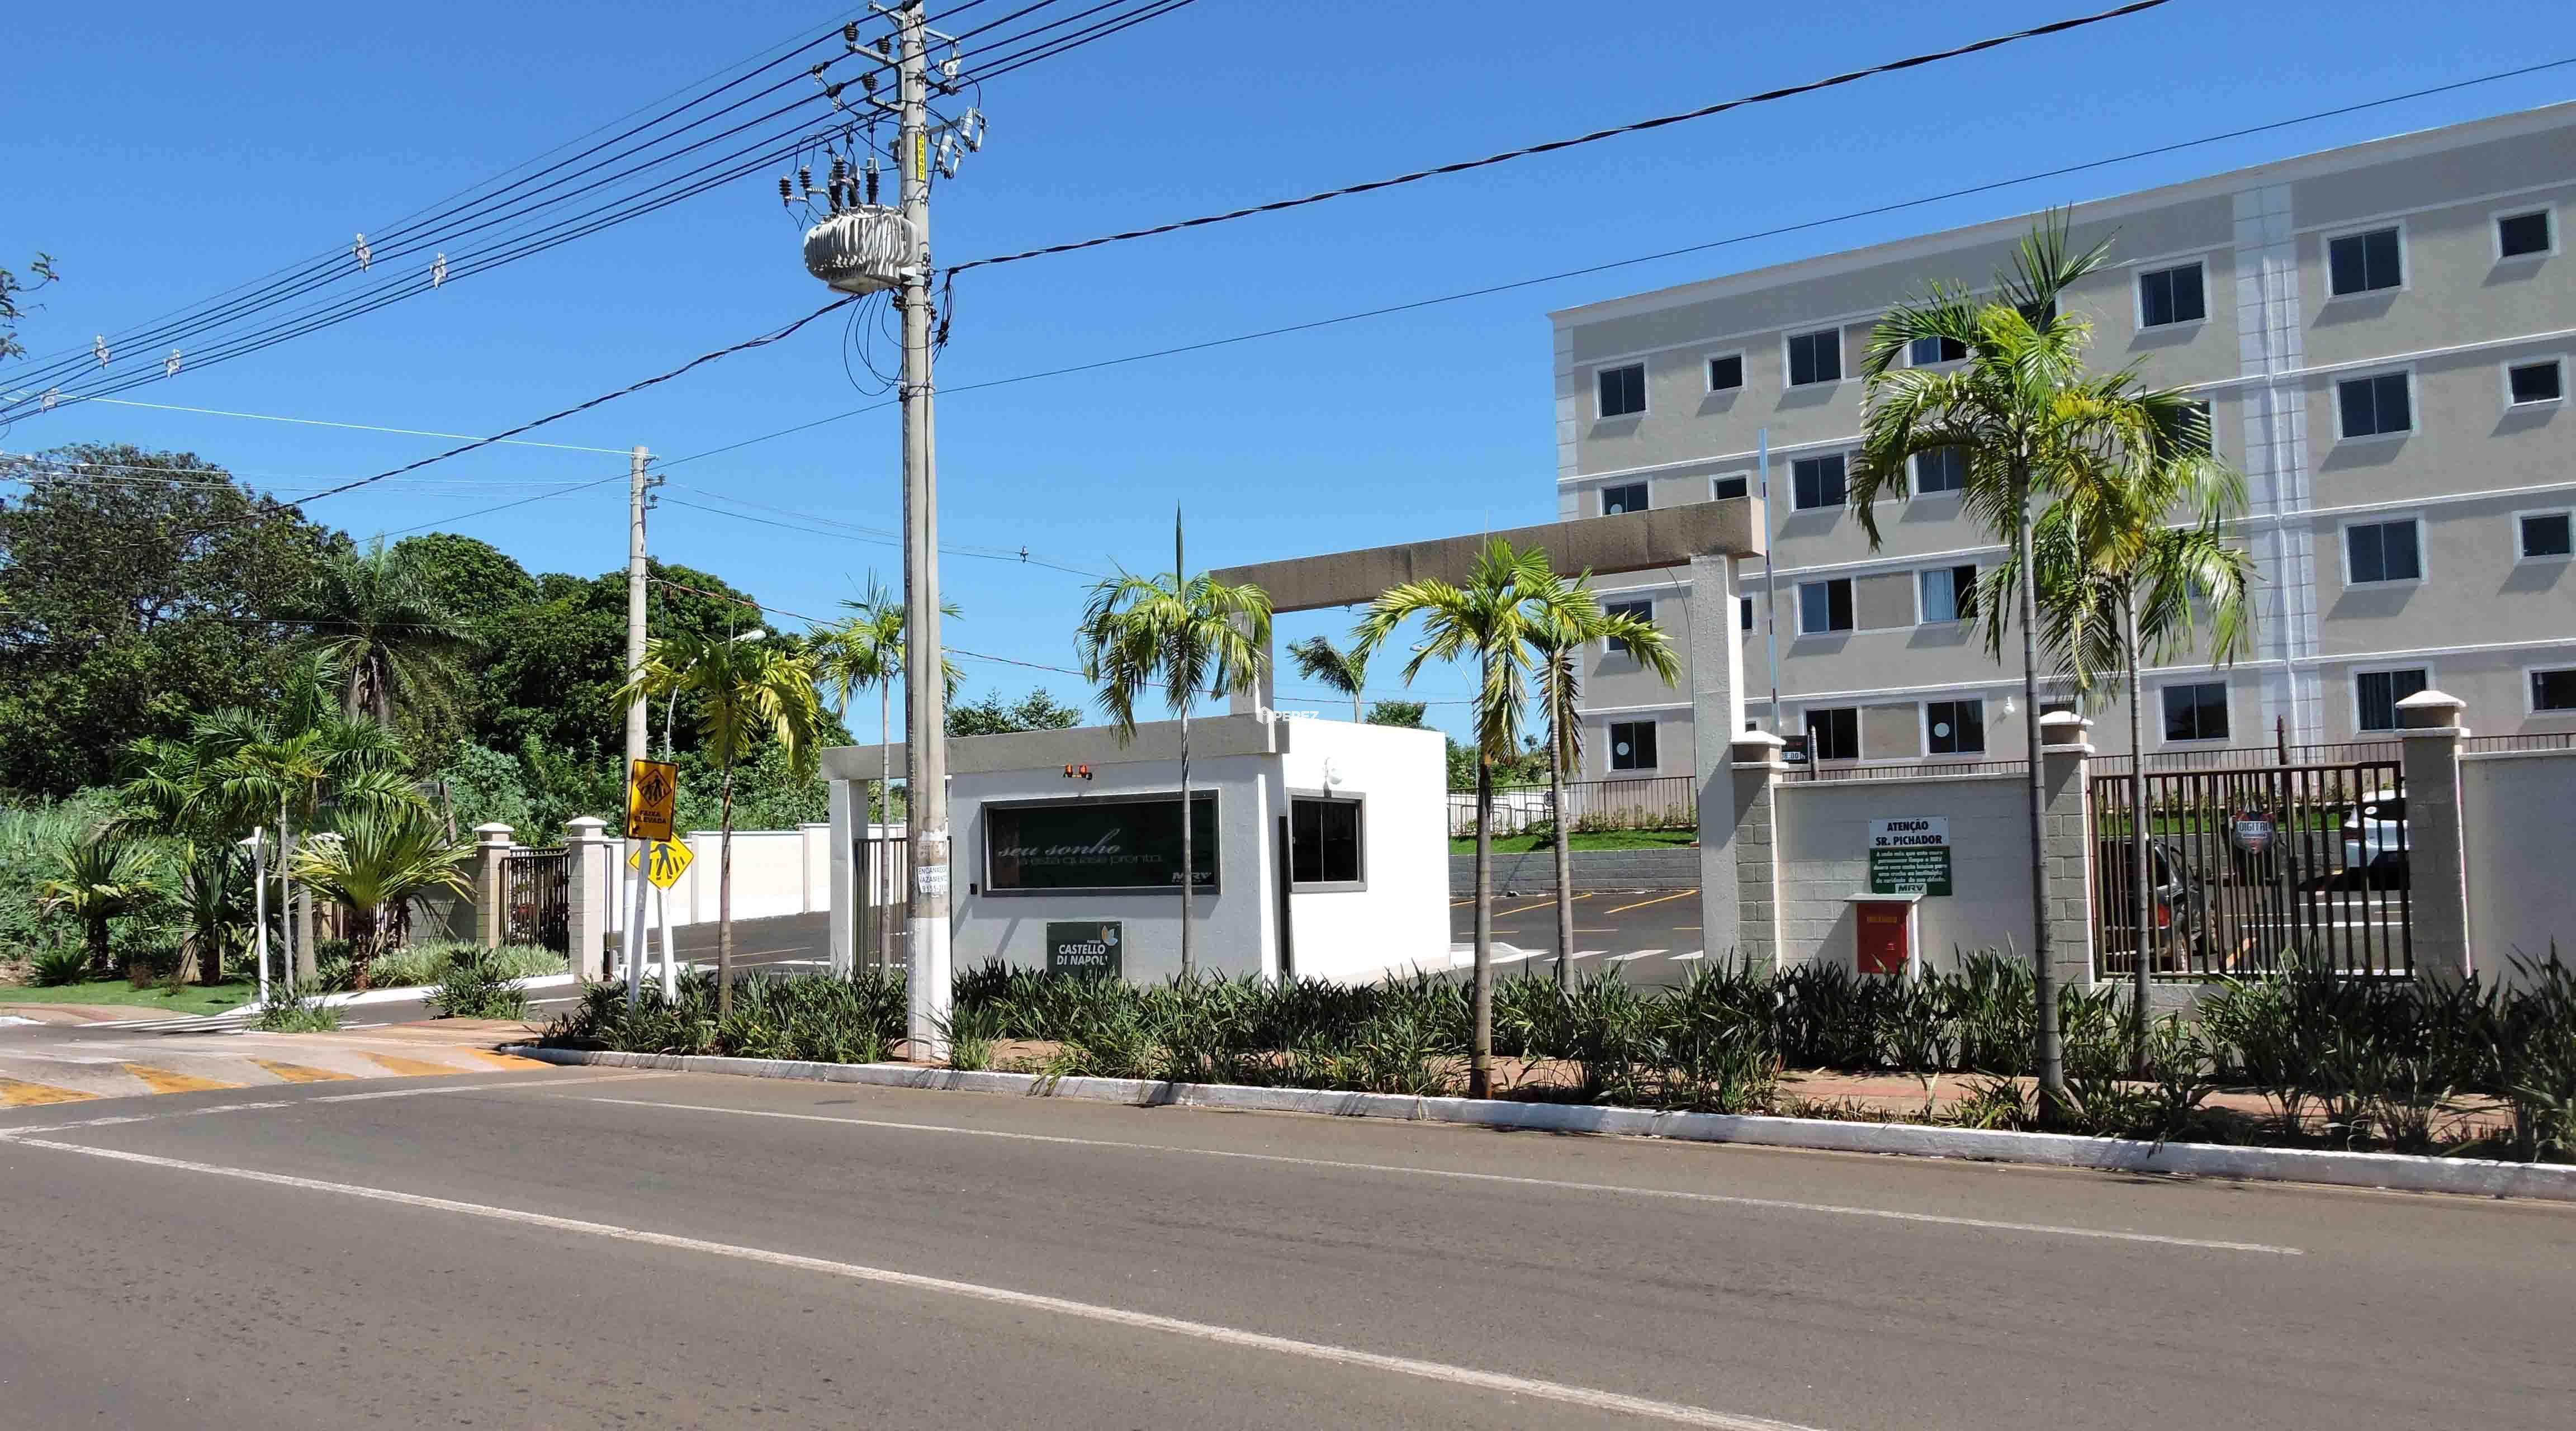 venda-campo-grande-ms-apartamento-prefeito-heraclito-jose-diniz-de-figueiredo-jardim-seminario-perez-imoveis